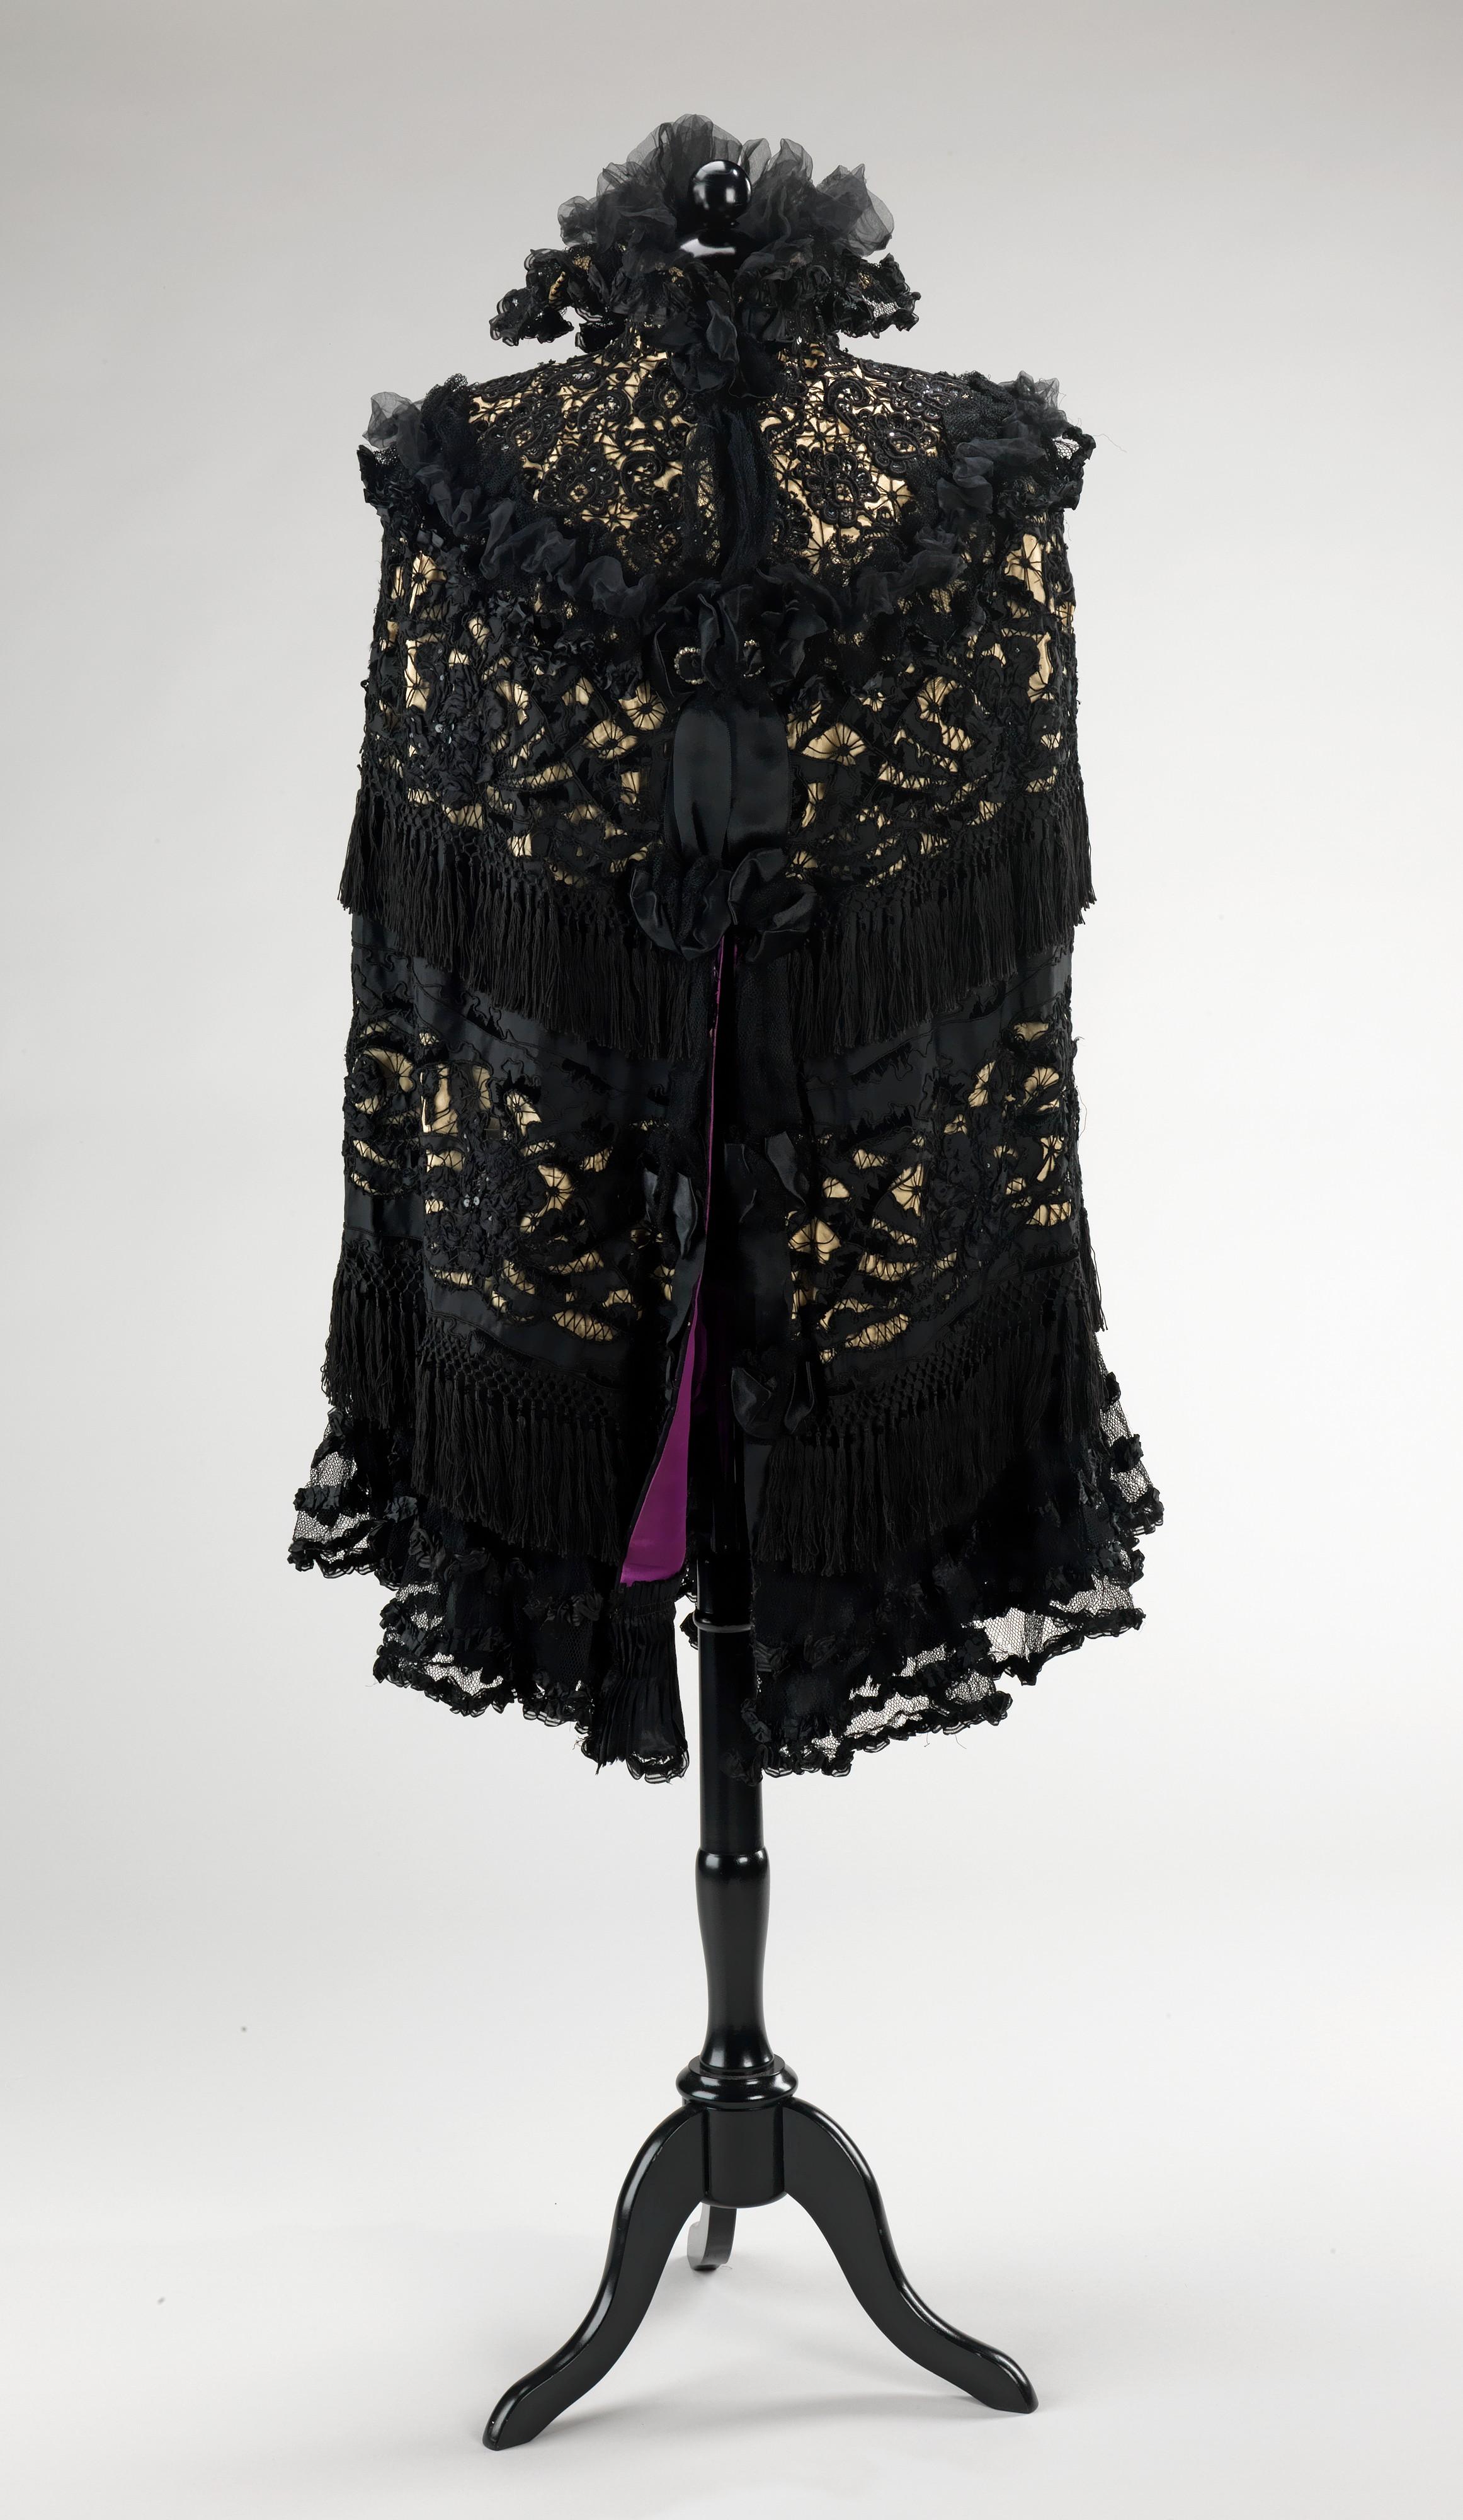 Mourning cape, Abraham & Straus, silk, American